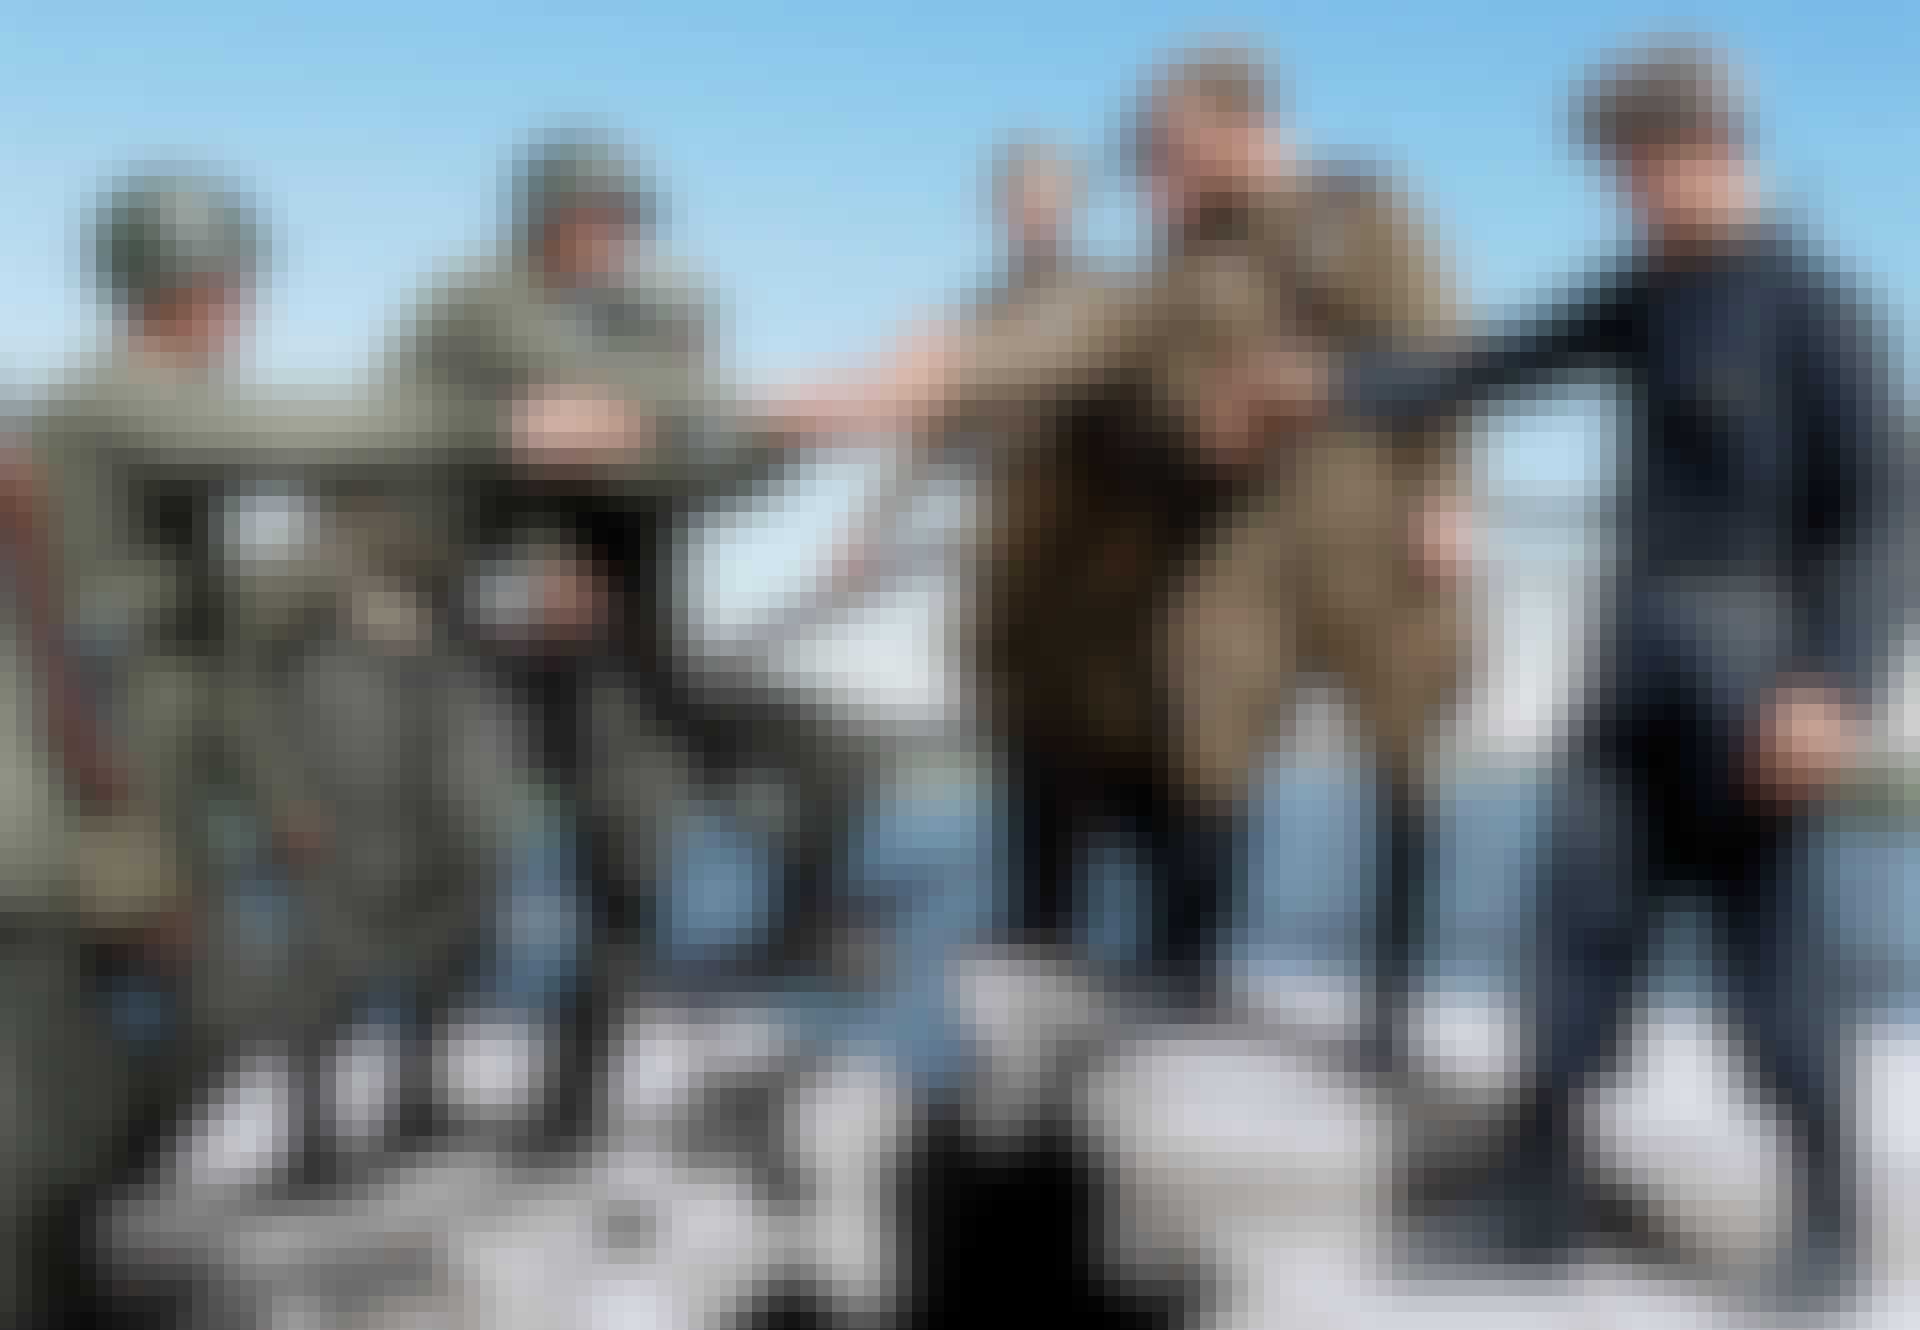 us soldiers red army meet at thorgau